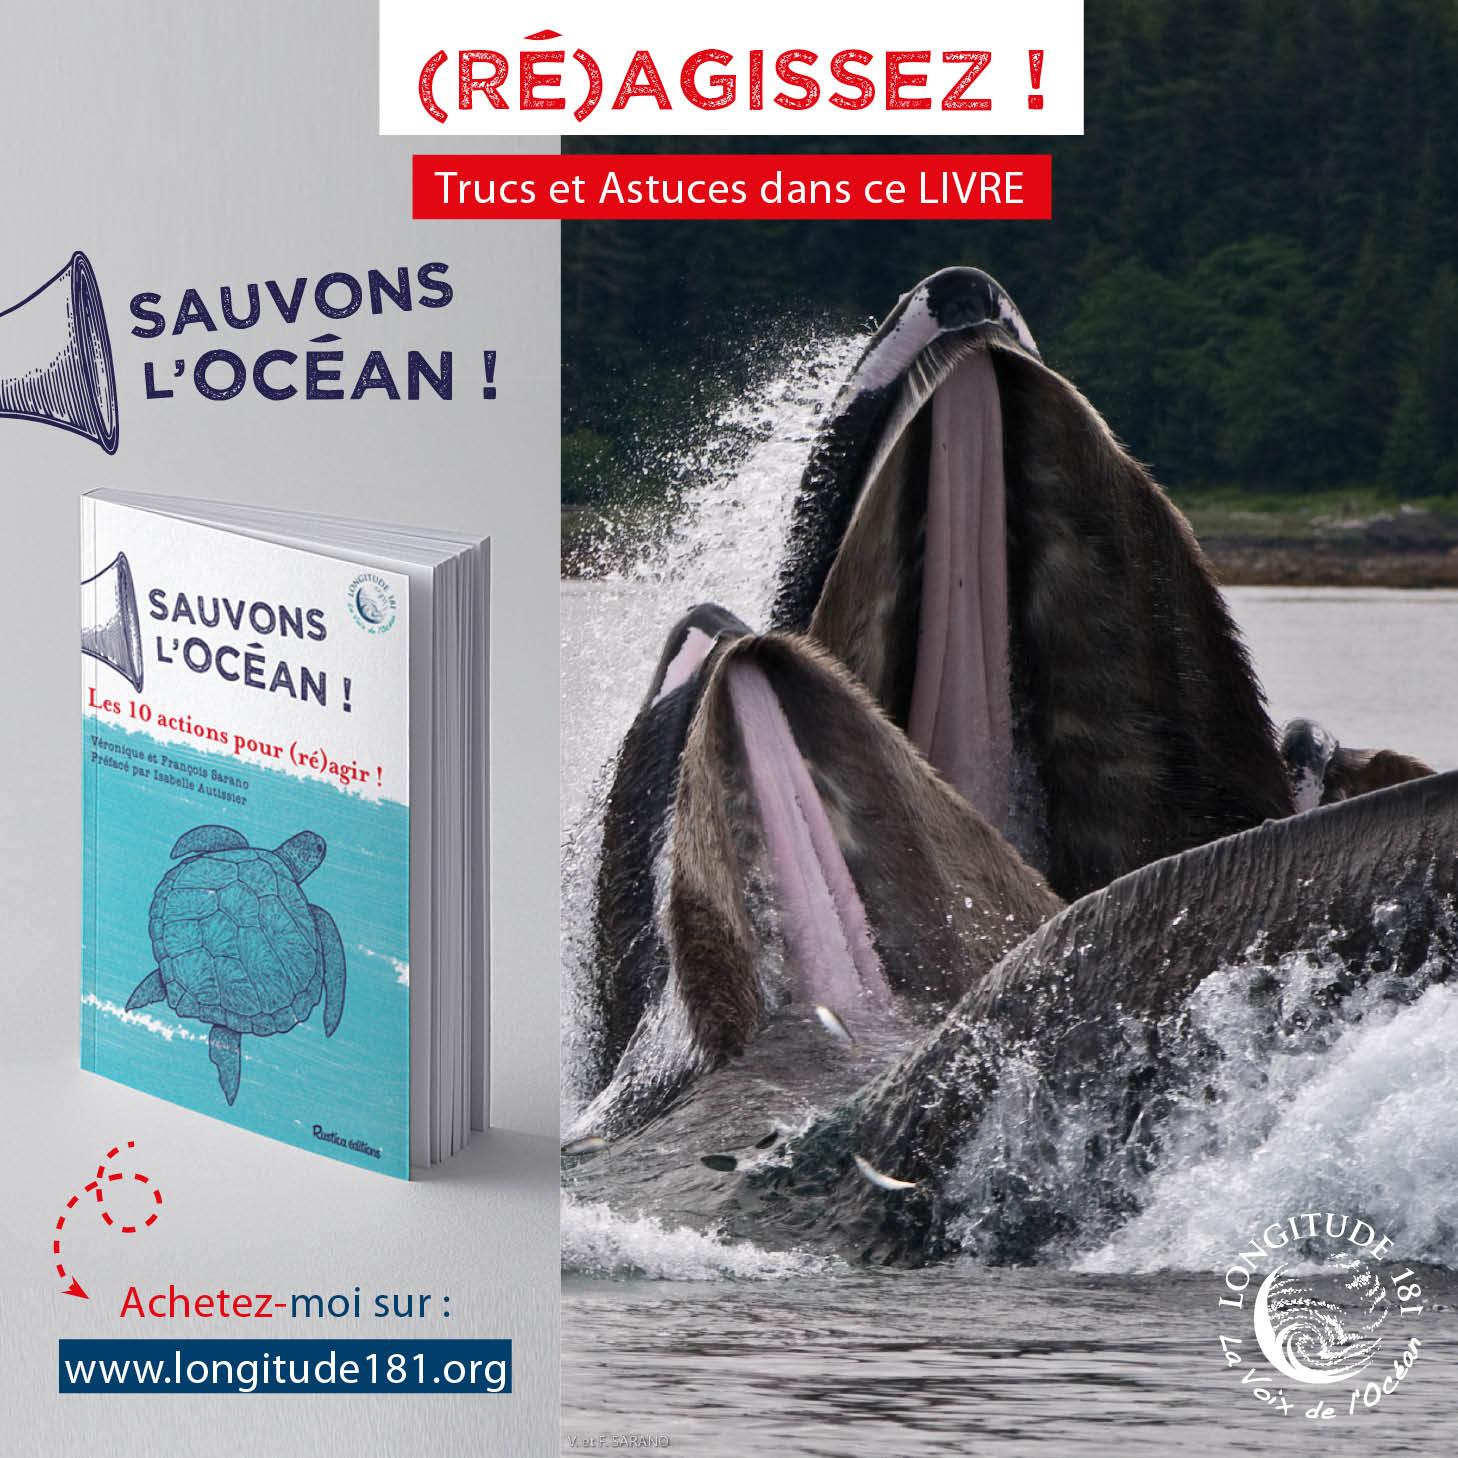 Sauvons l ocean post Fb baleine